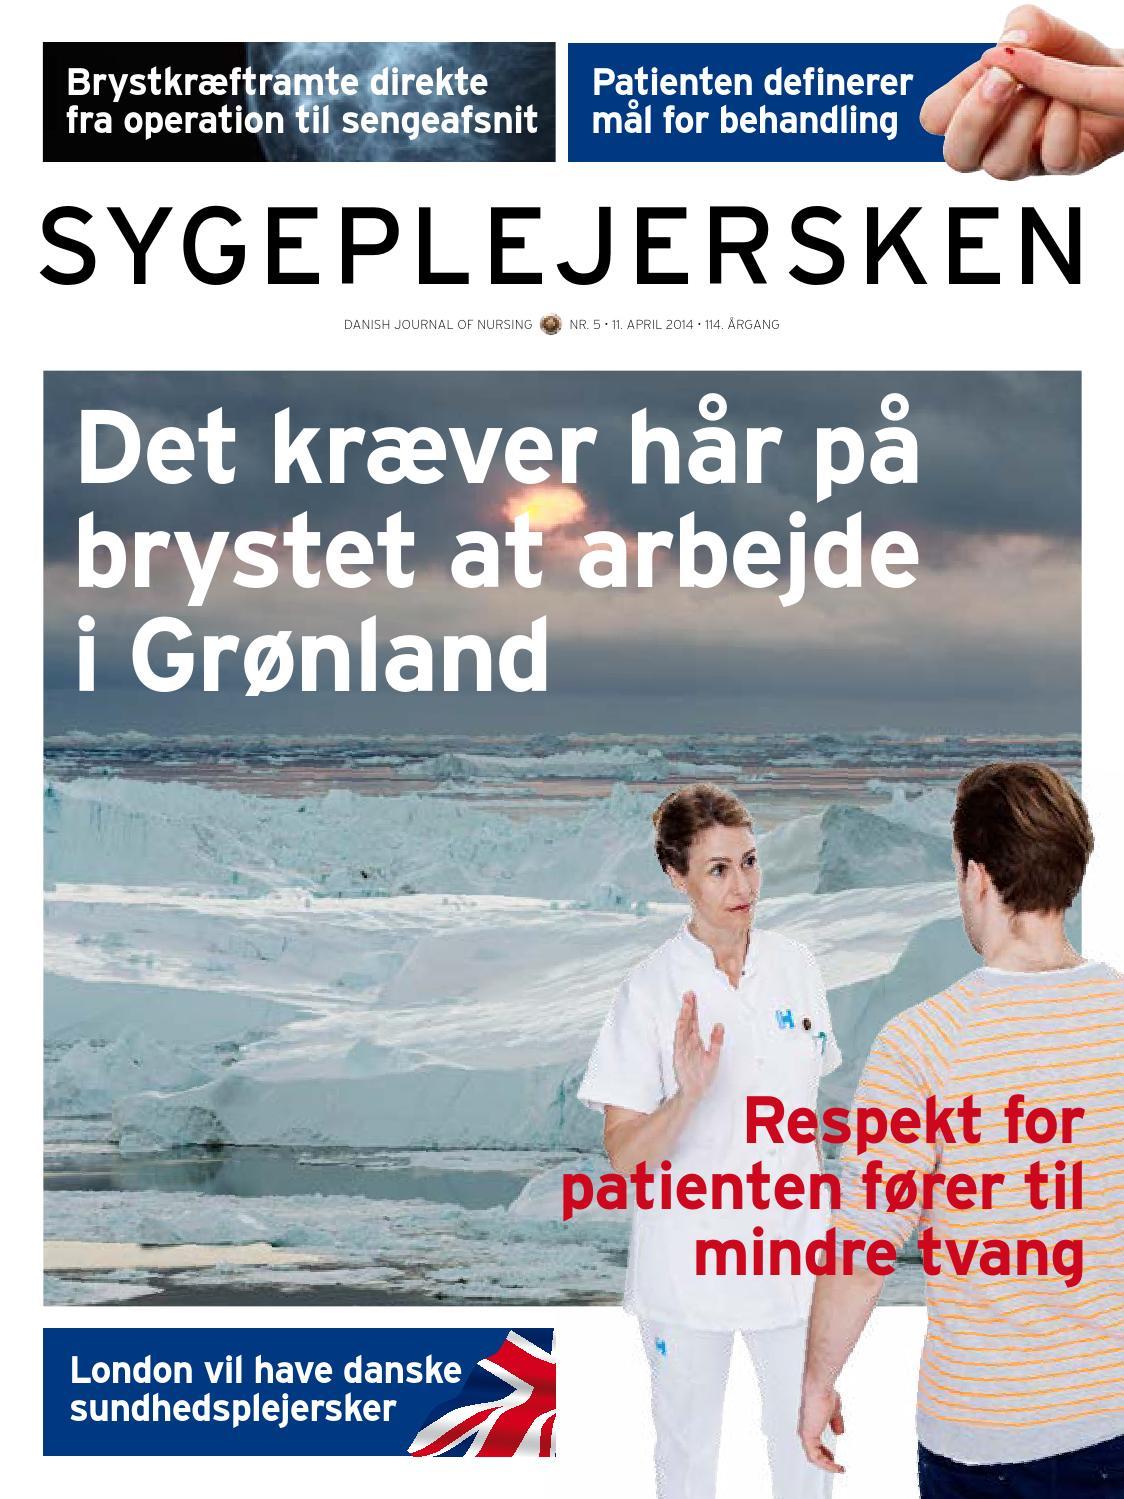 6000 dkk in euro klinik for kønssygdomme bispebjerg